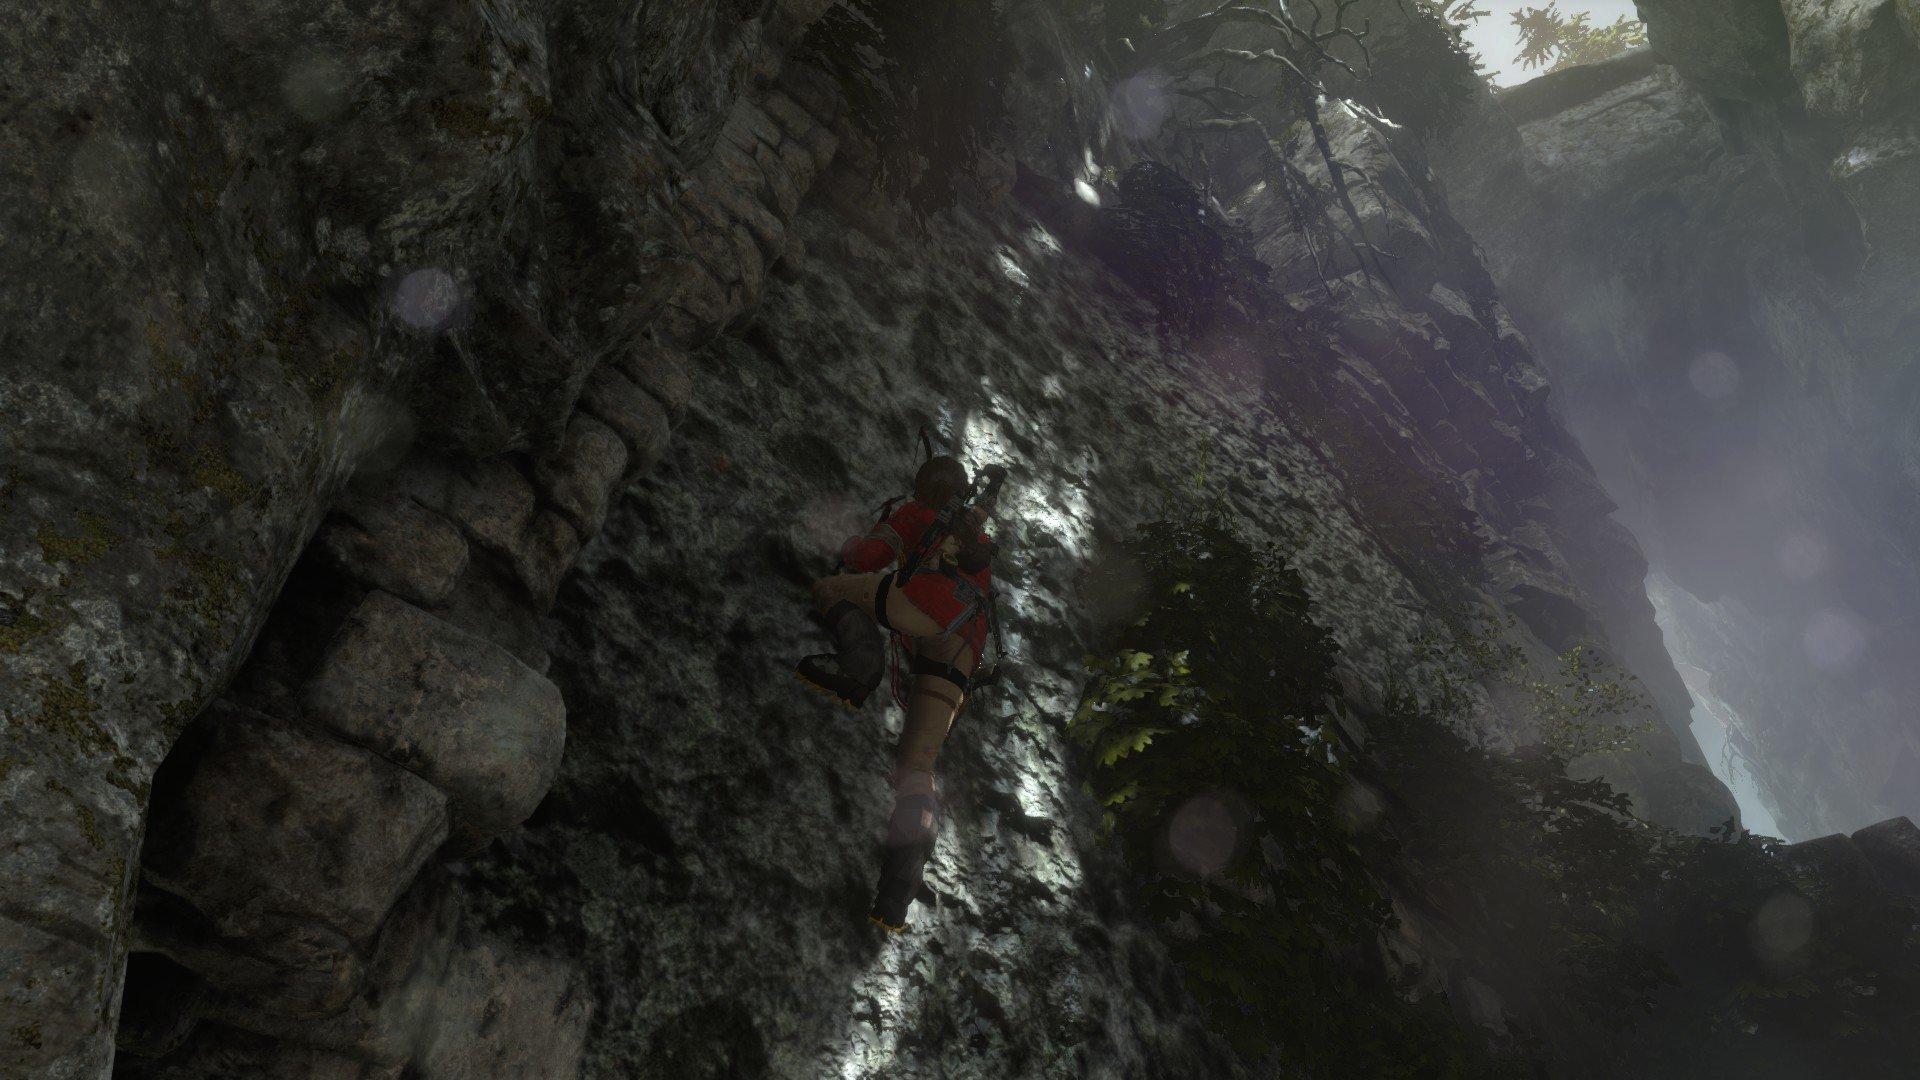 Rise of the Tomb Raider или да когда же этот медведь сдохнет?. - Изображение 21